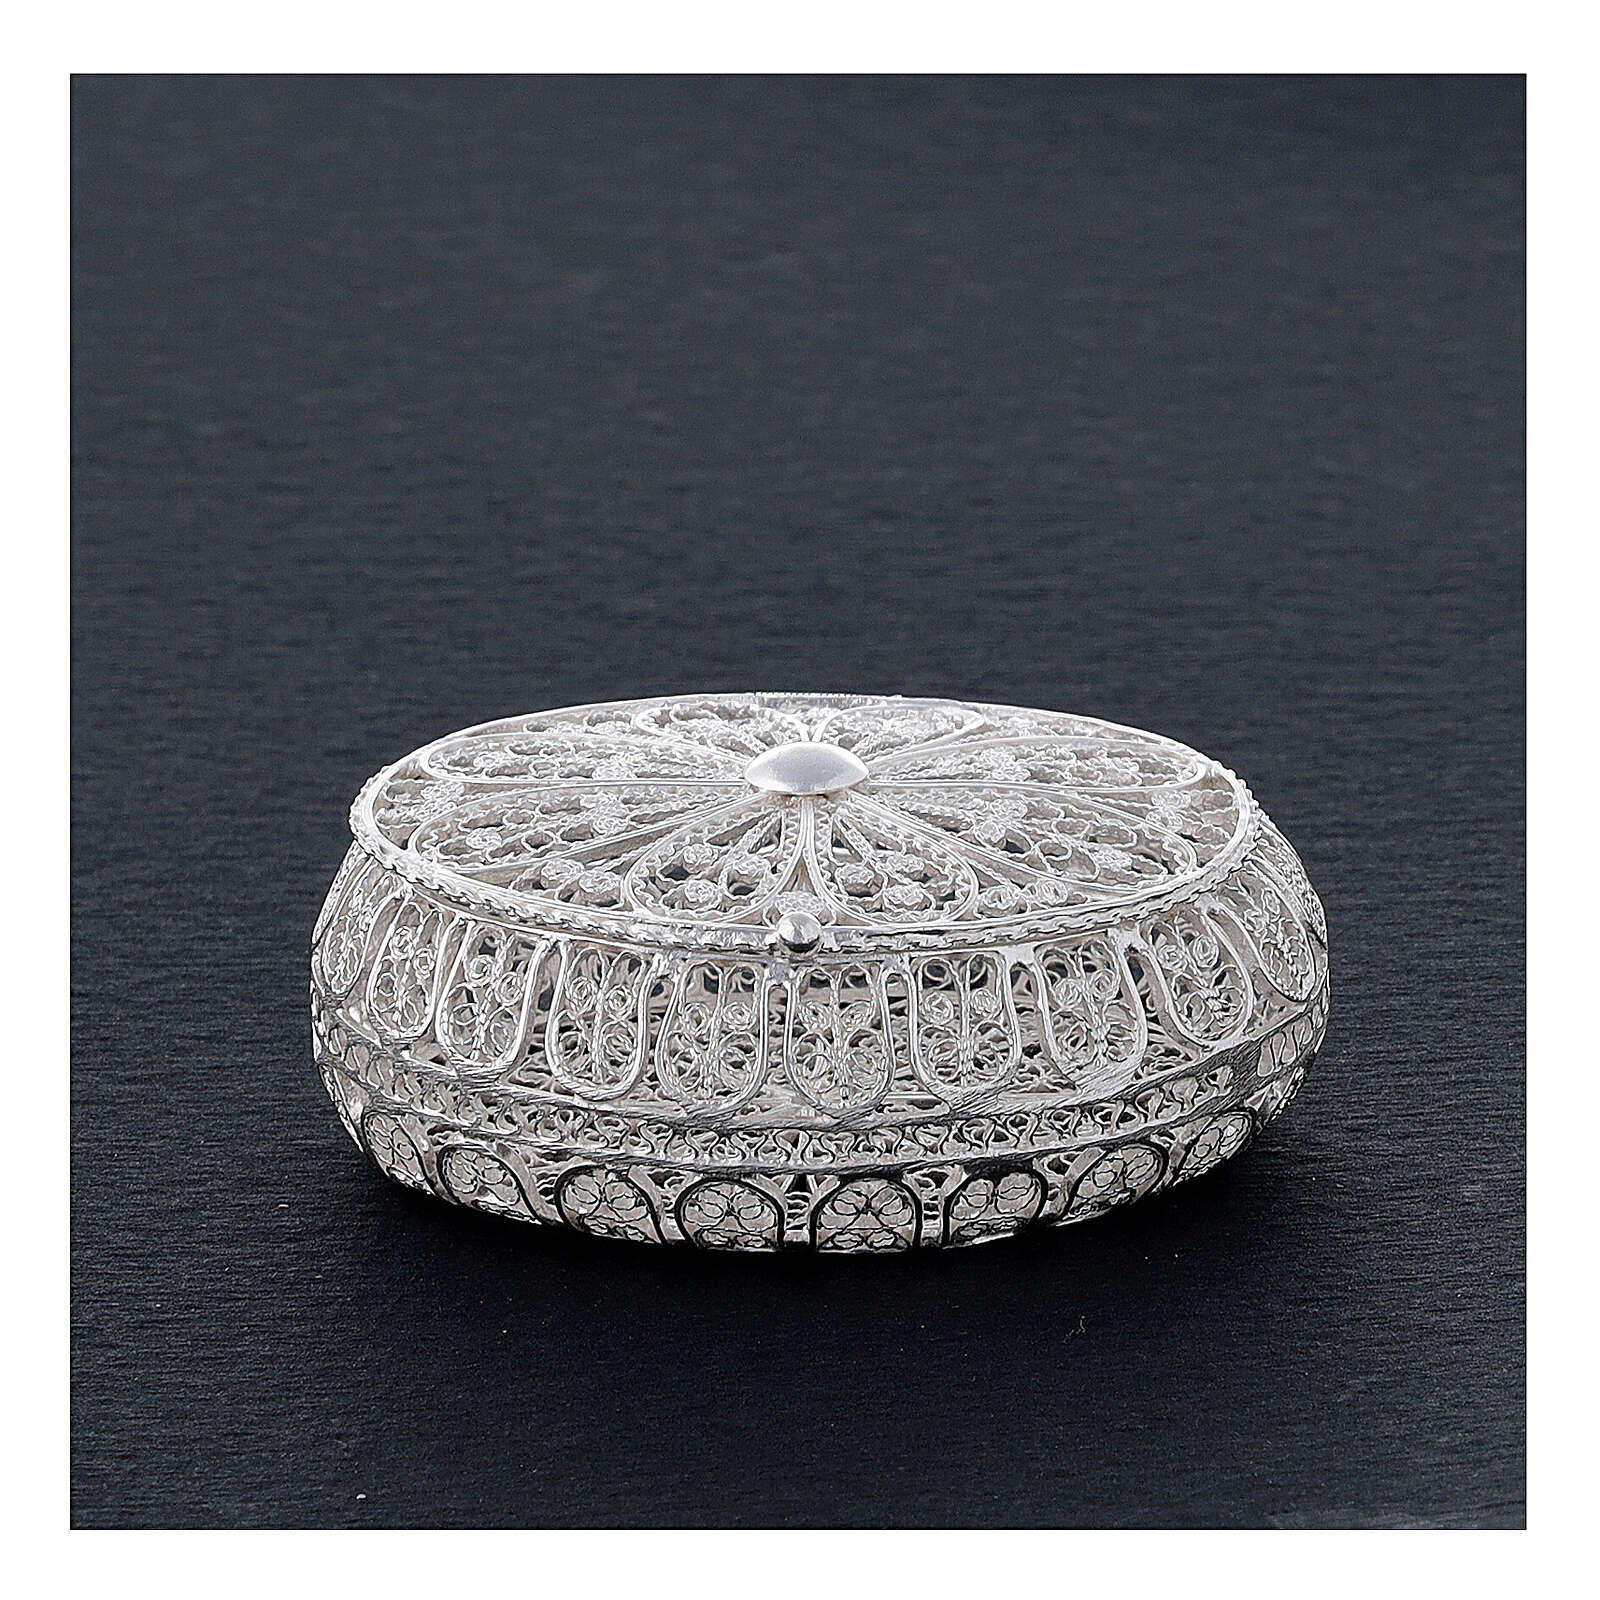 Estuche para rosario filigrana plata 800 ovalado 5,5x4,5 cm 4